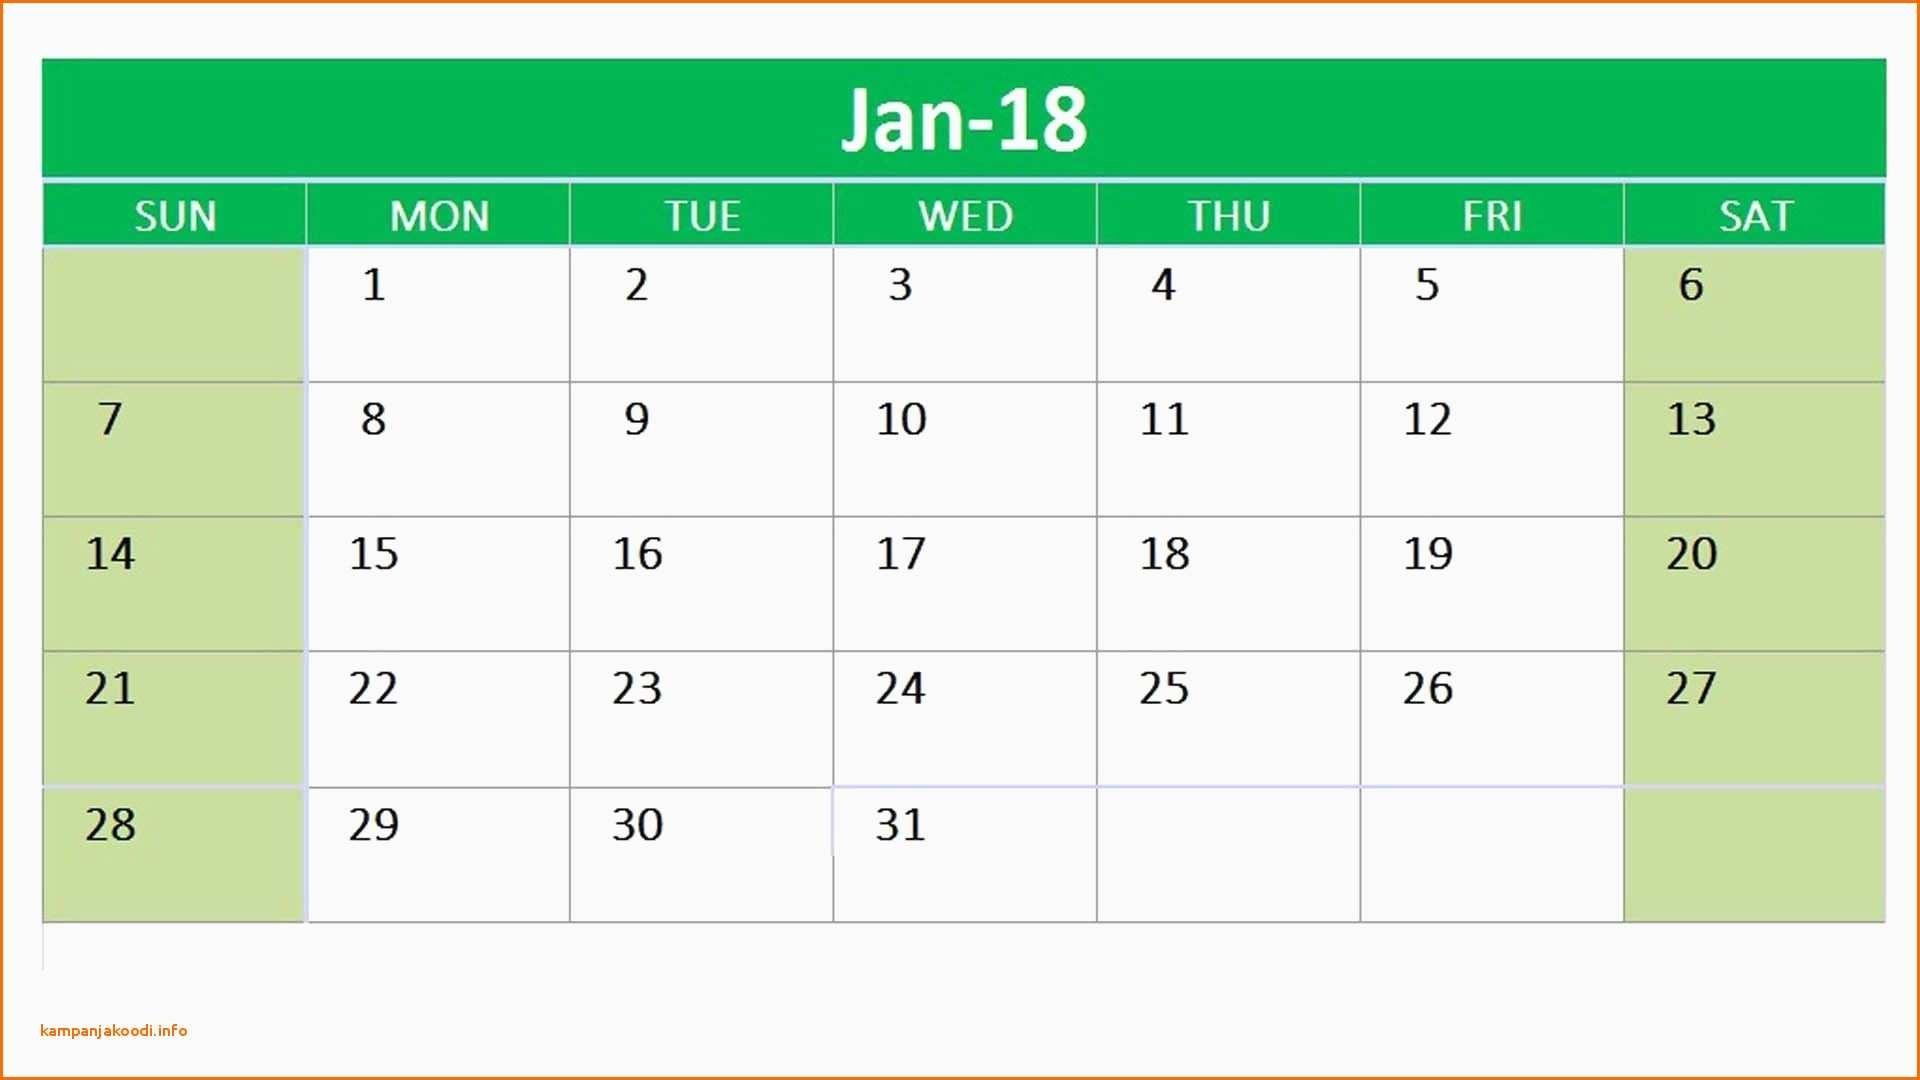 March Calendar 2018 Recientes Printable Calendars Fitness Calendar Template New Free Printable Of March Calendar 2018 Recientes Calendar 2019 March Graph Template for Kids Fresh Graphs